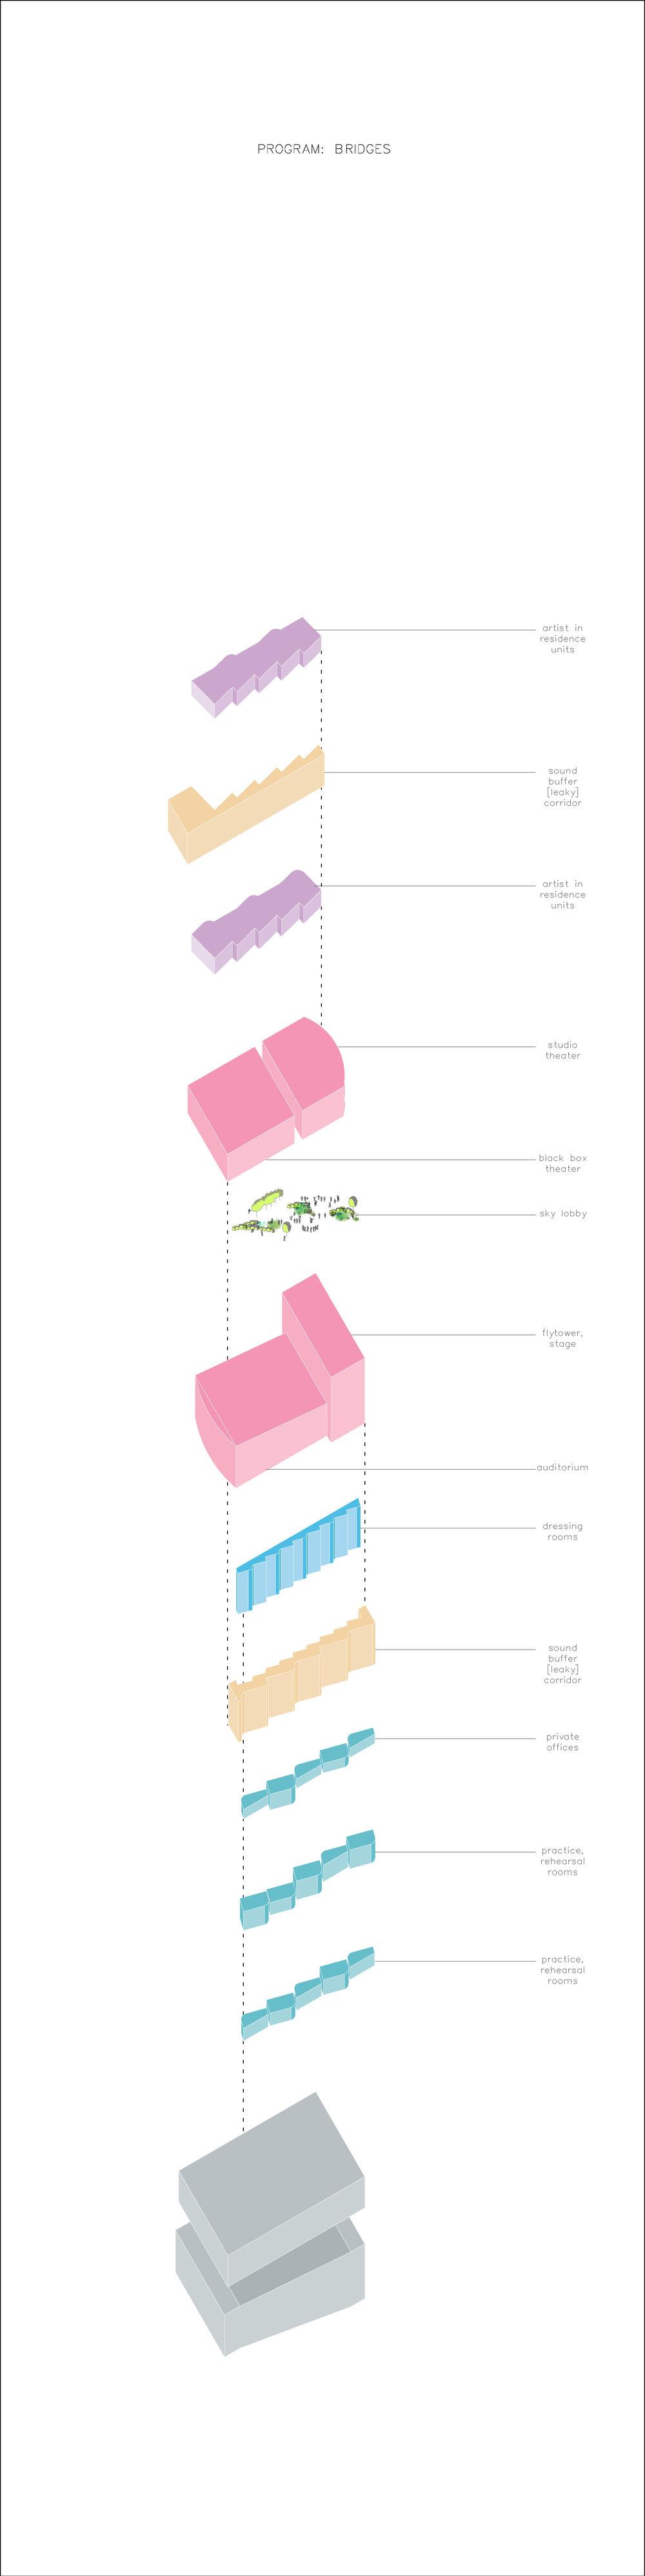 diagrams 1203_Page_2.jpg